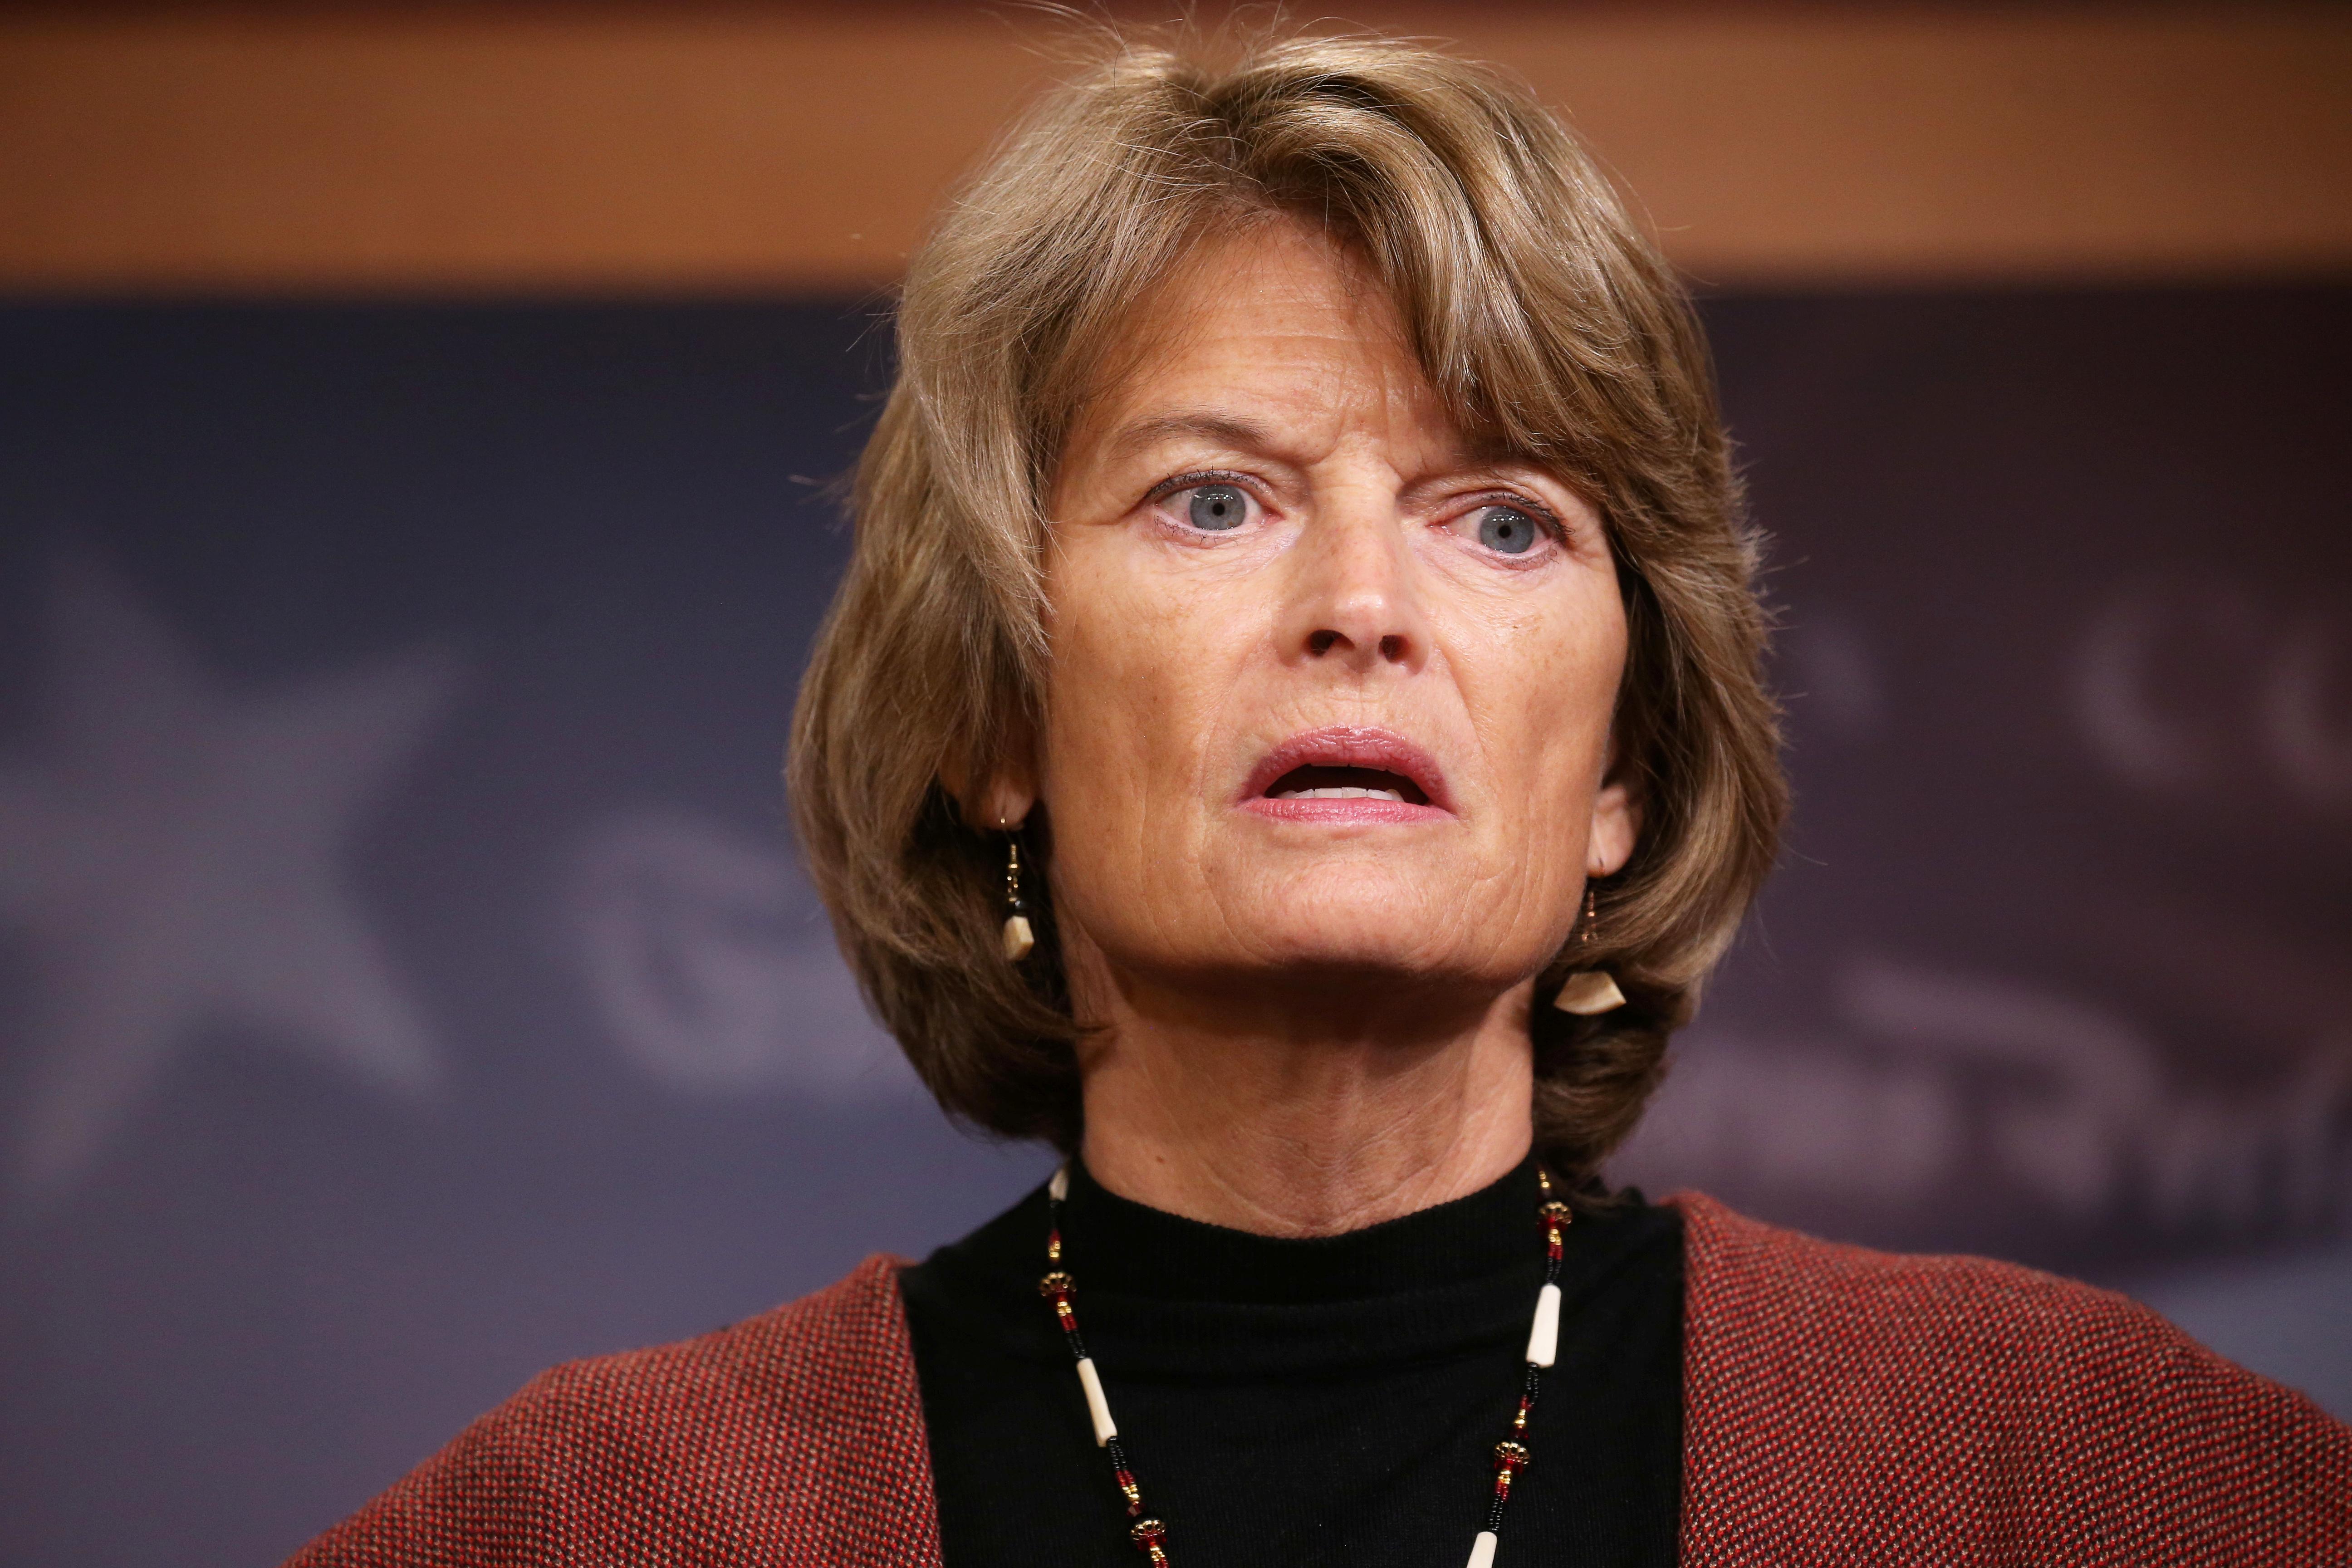 U.S. Senator Lisa Murkowski (R-AK) speaks at a news conference on Capitol Hill in Washington